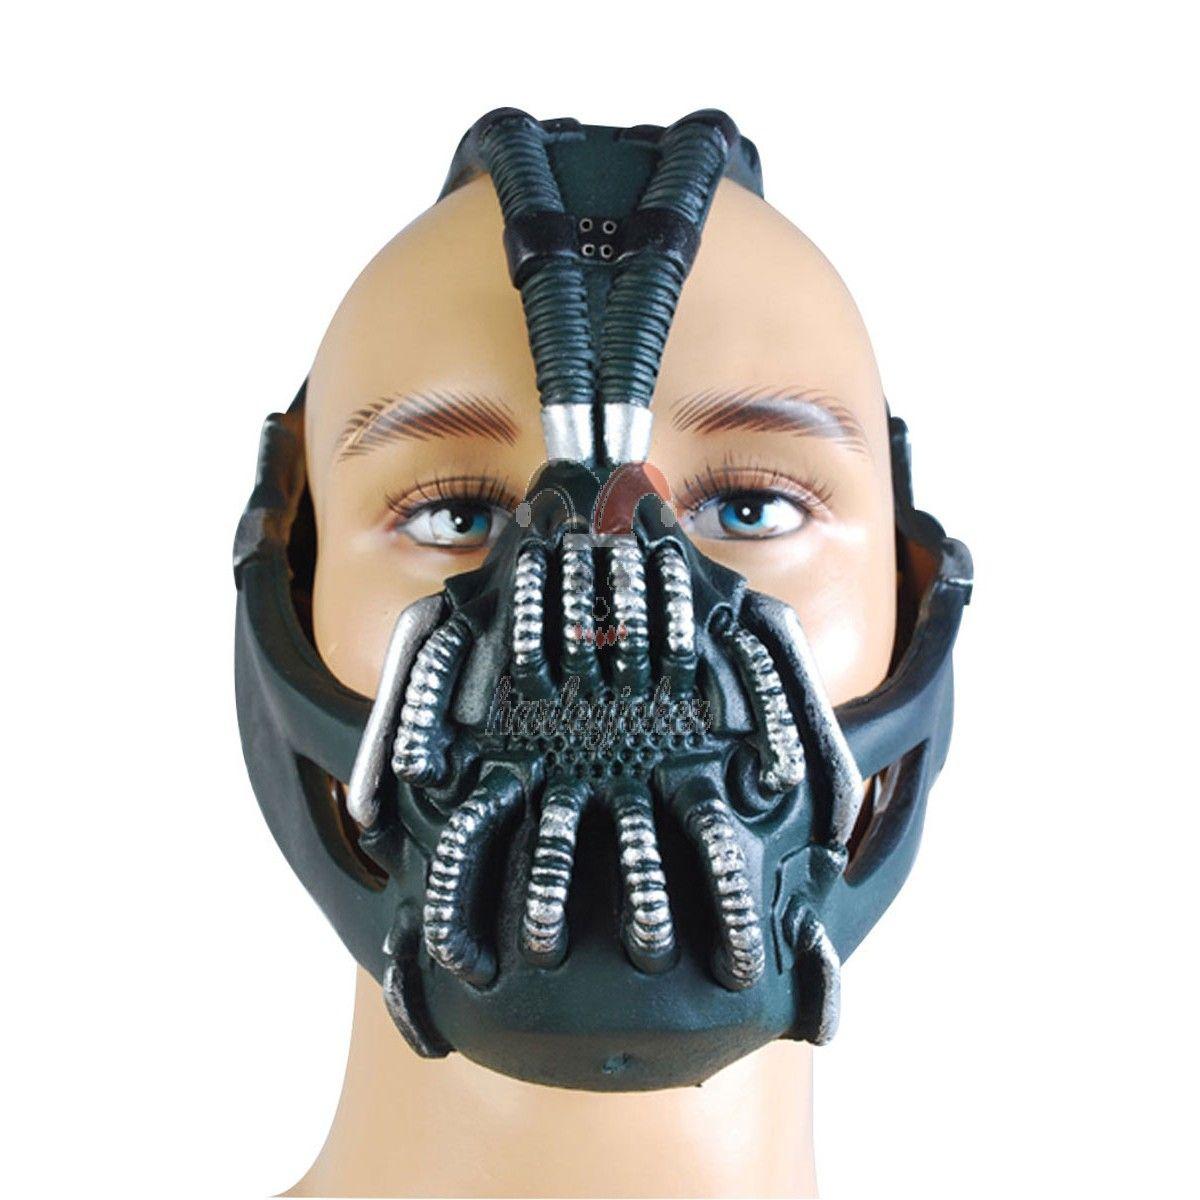 Bane Mask Replica for Batman the Dark Knight Rises Costume Prop - Batman Prop | Harley Joker Costume | Pinterest | Dark knight and Knight  sc 1 st  Pinterest & Bane Mask Replica for Batman the Dark Knight Rises Costume Prop ...